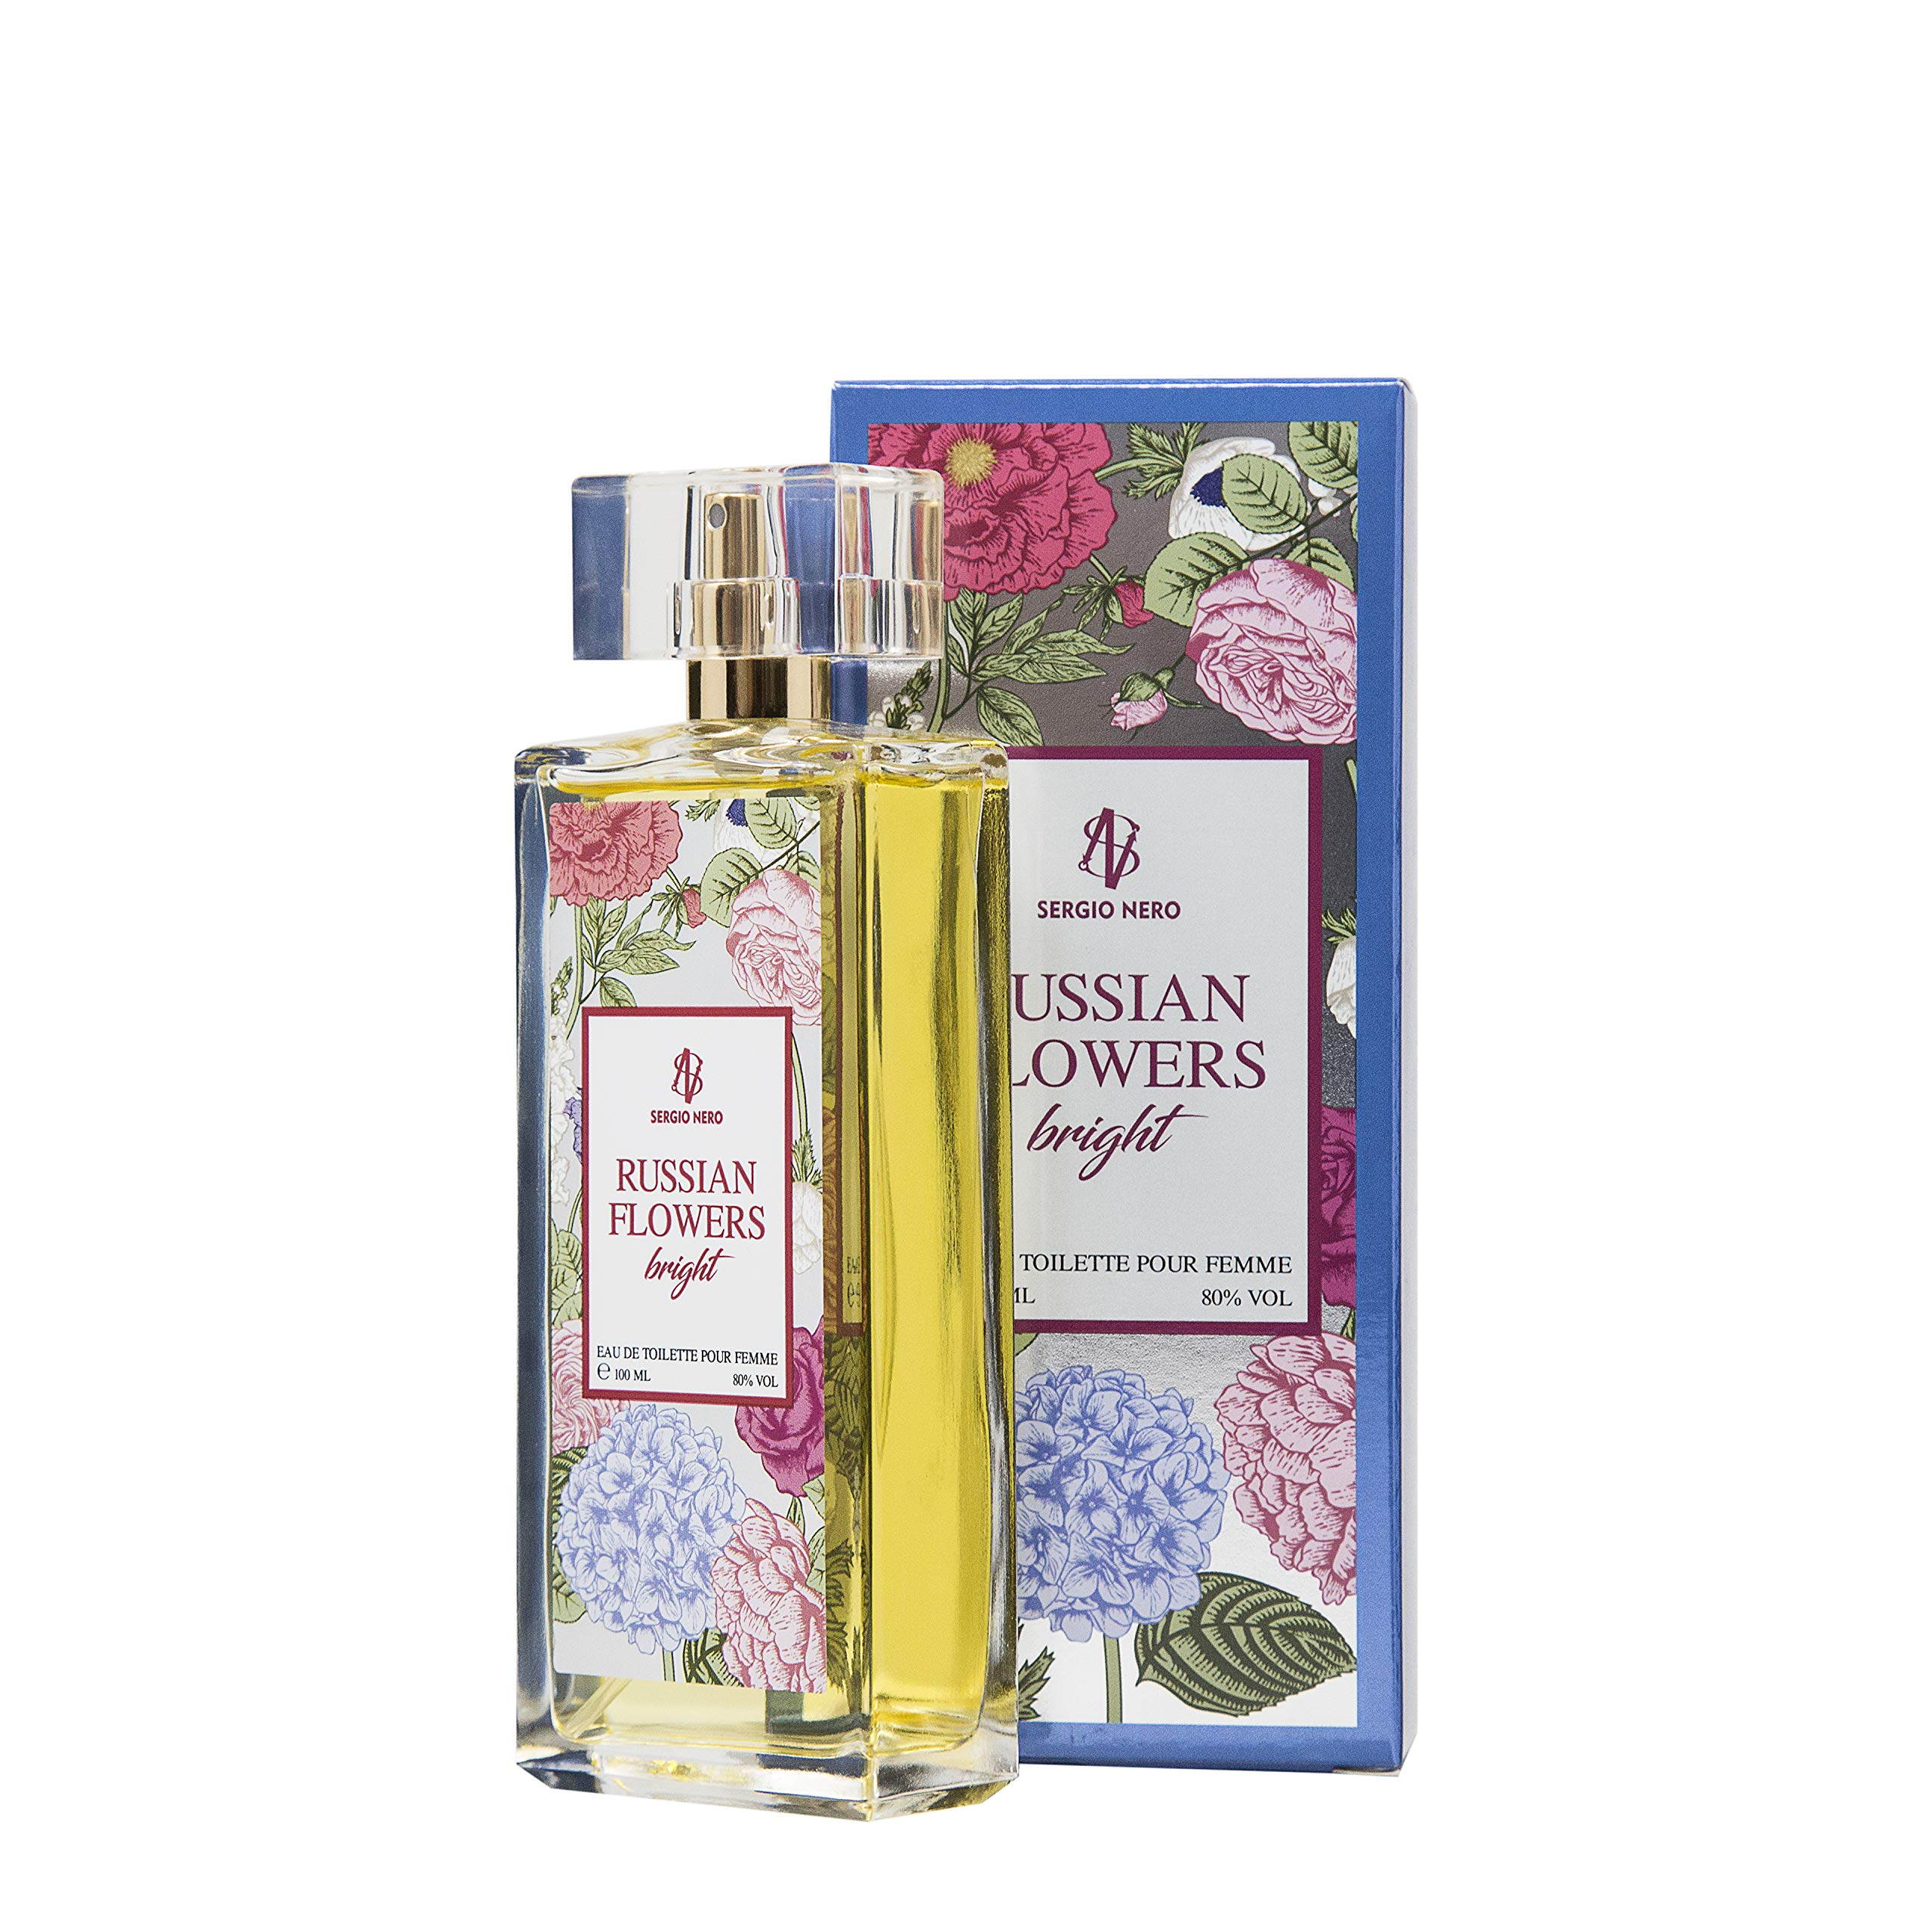 RUSSIAN FLOWERS Eau de Toilette for Women, 100 ml - NEW Floral Fragrance for Her (BRIGHT)